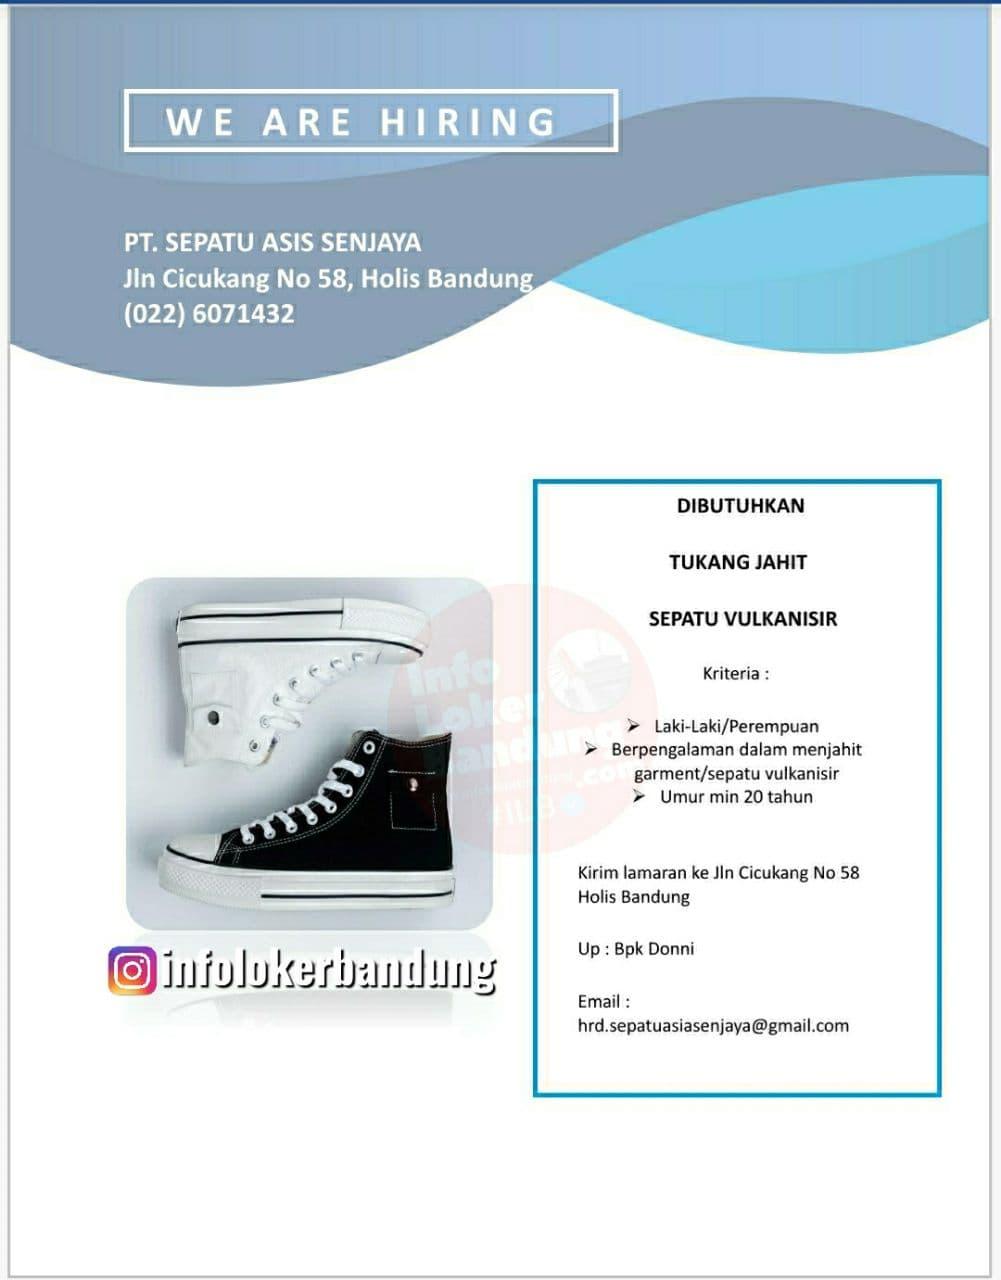 Lowongan Kerja Tukang Jahit Sepatu Vulkanisir PT. Sepatu Asis Senjaya Bandung Agustus 2021